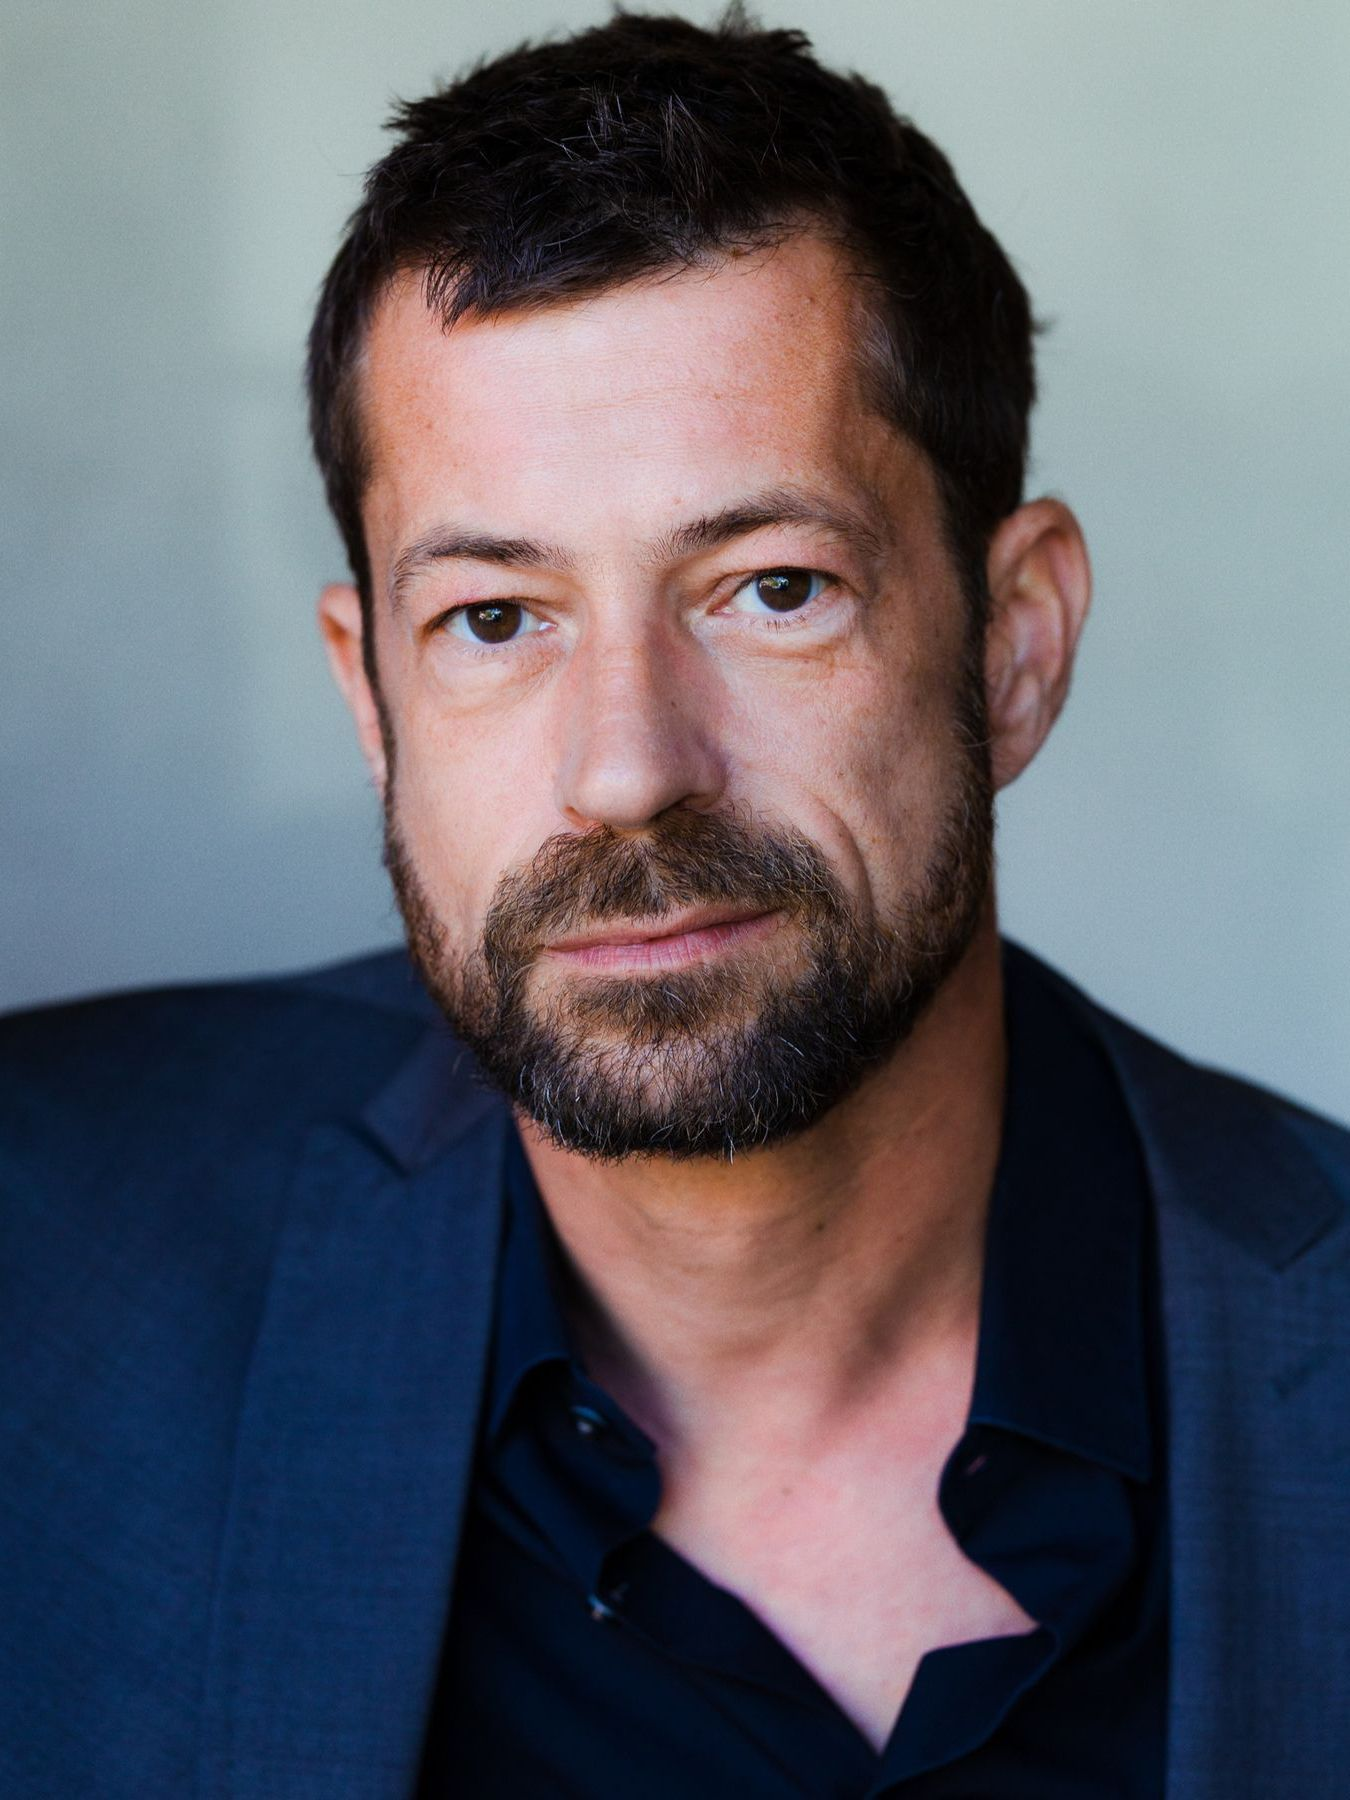 Jens Eulenberger, Actors Agency Osman, Schauspielagentur Berlin